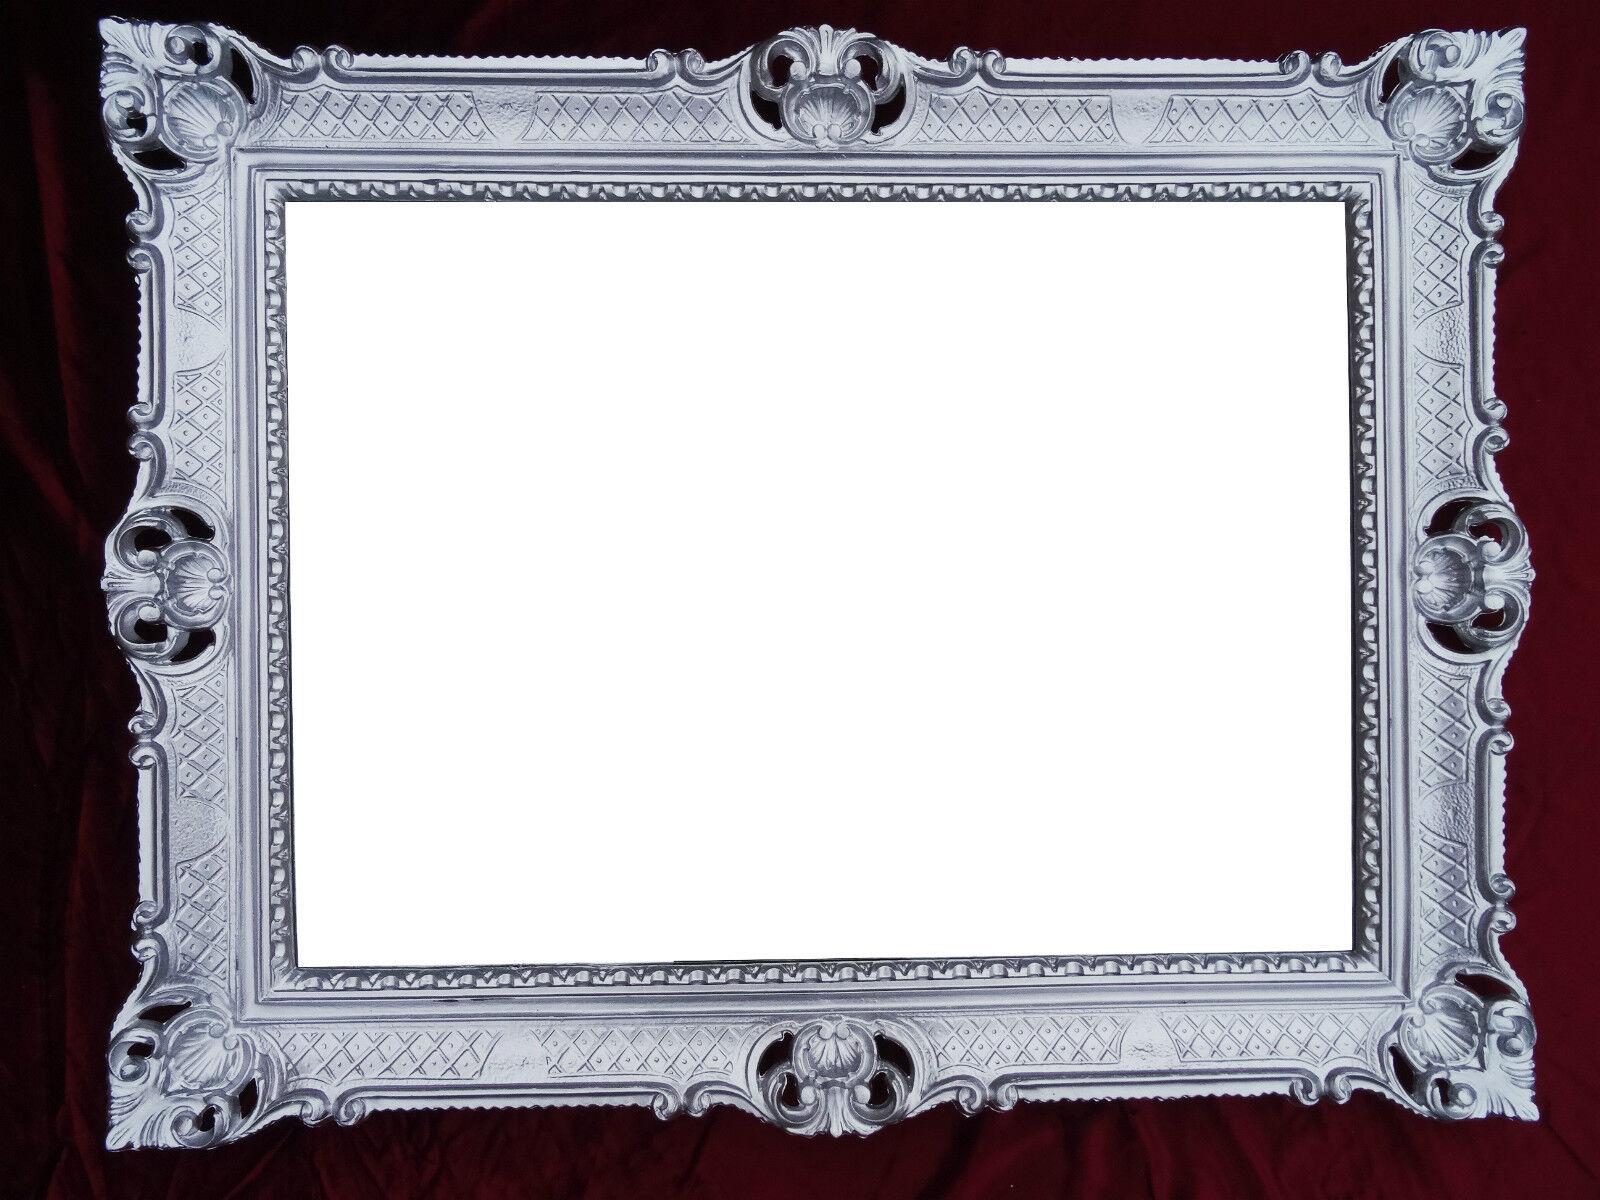 bilderrahmen 90x70 cm spiegelrahmen antik repro barock gold rechtkig reg3057 g ebay. Black Bedroom Furniture Sets. Home Design Ideas